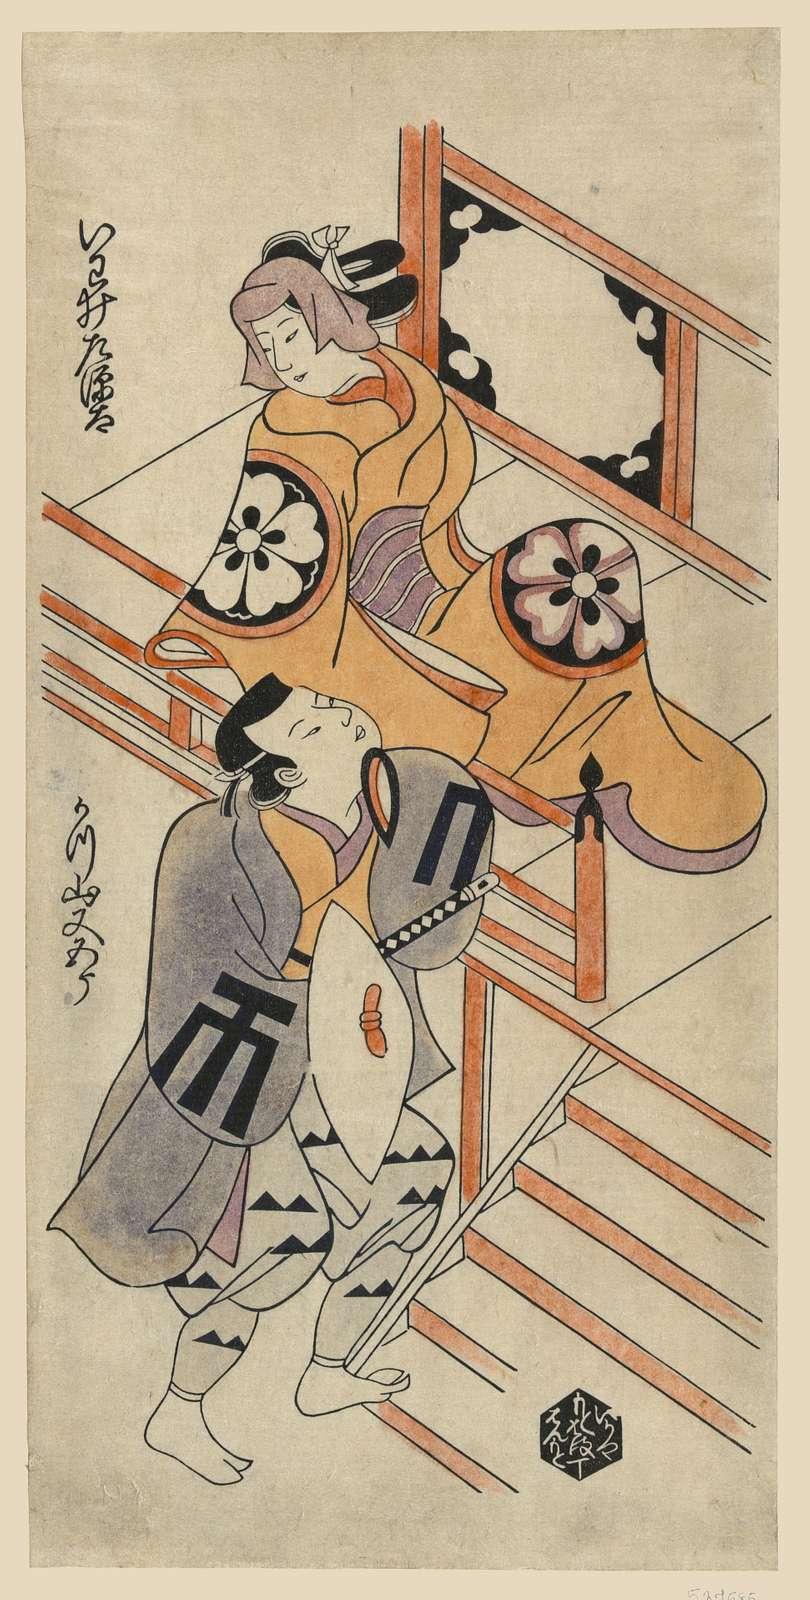 Iwai sagenta [to] katsuyama matagorō